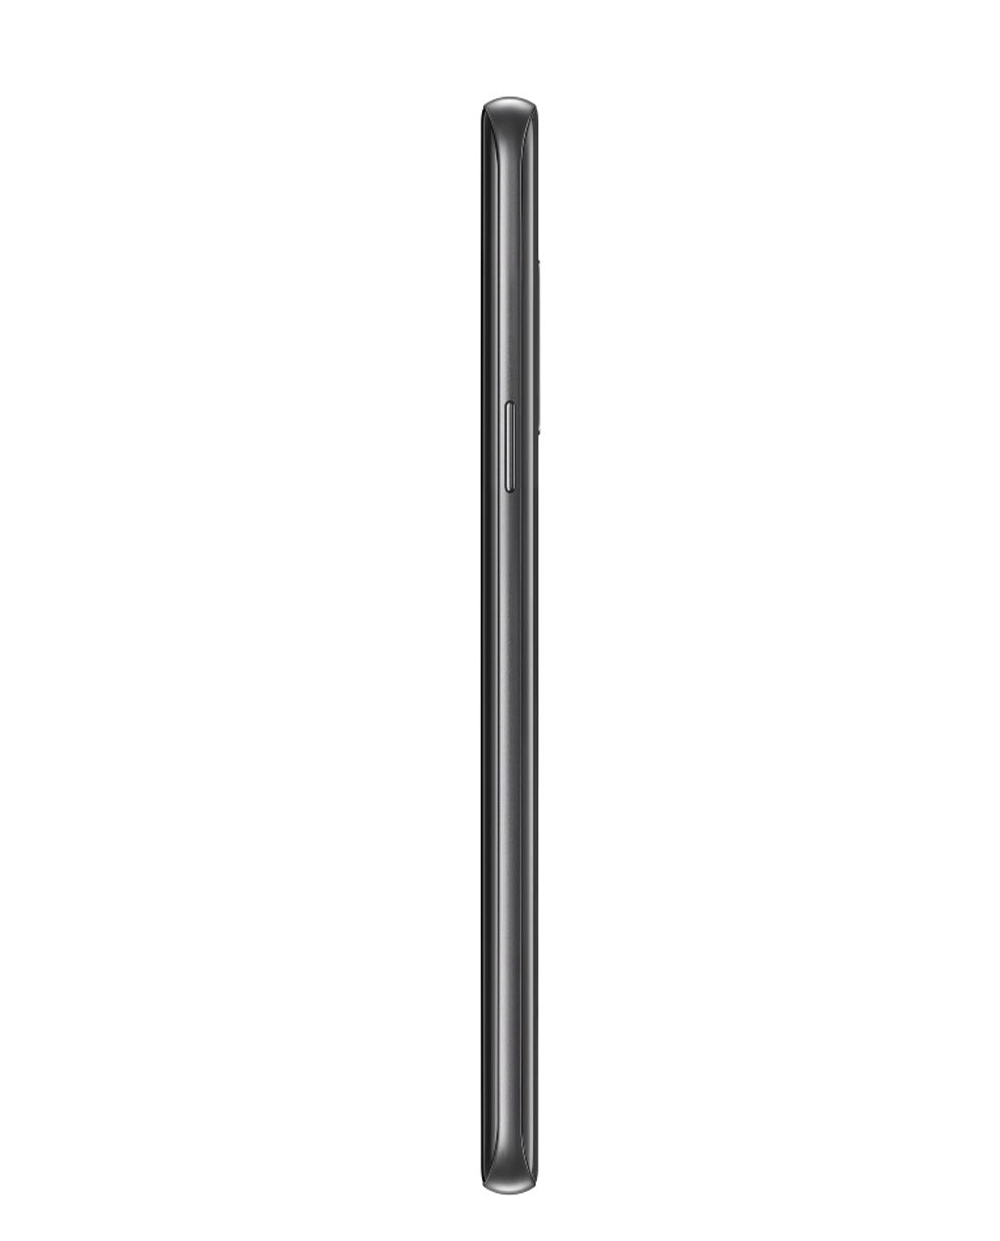 Samsung Galaxy S9 DUAL  (SM-G960) 357988095645581 - 3